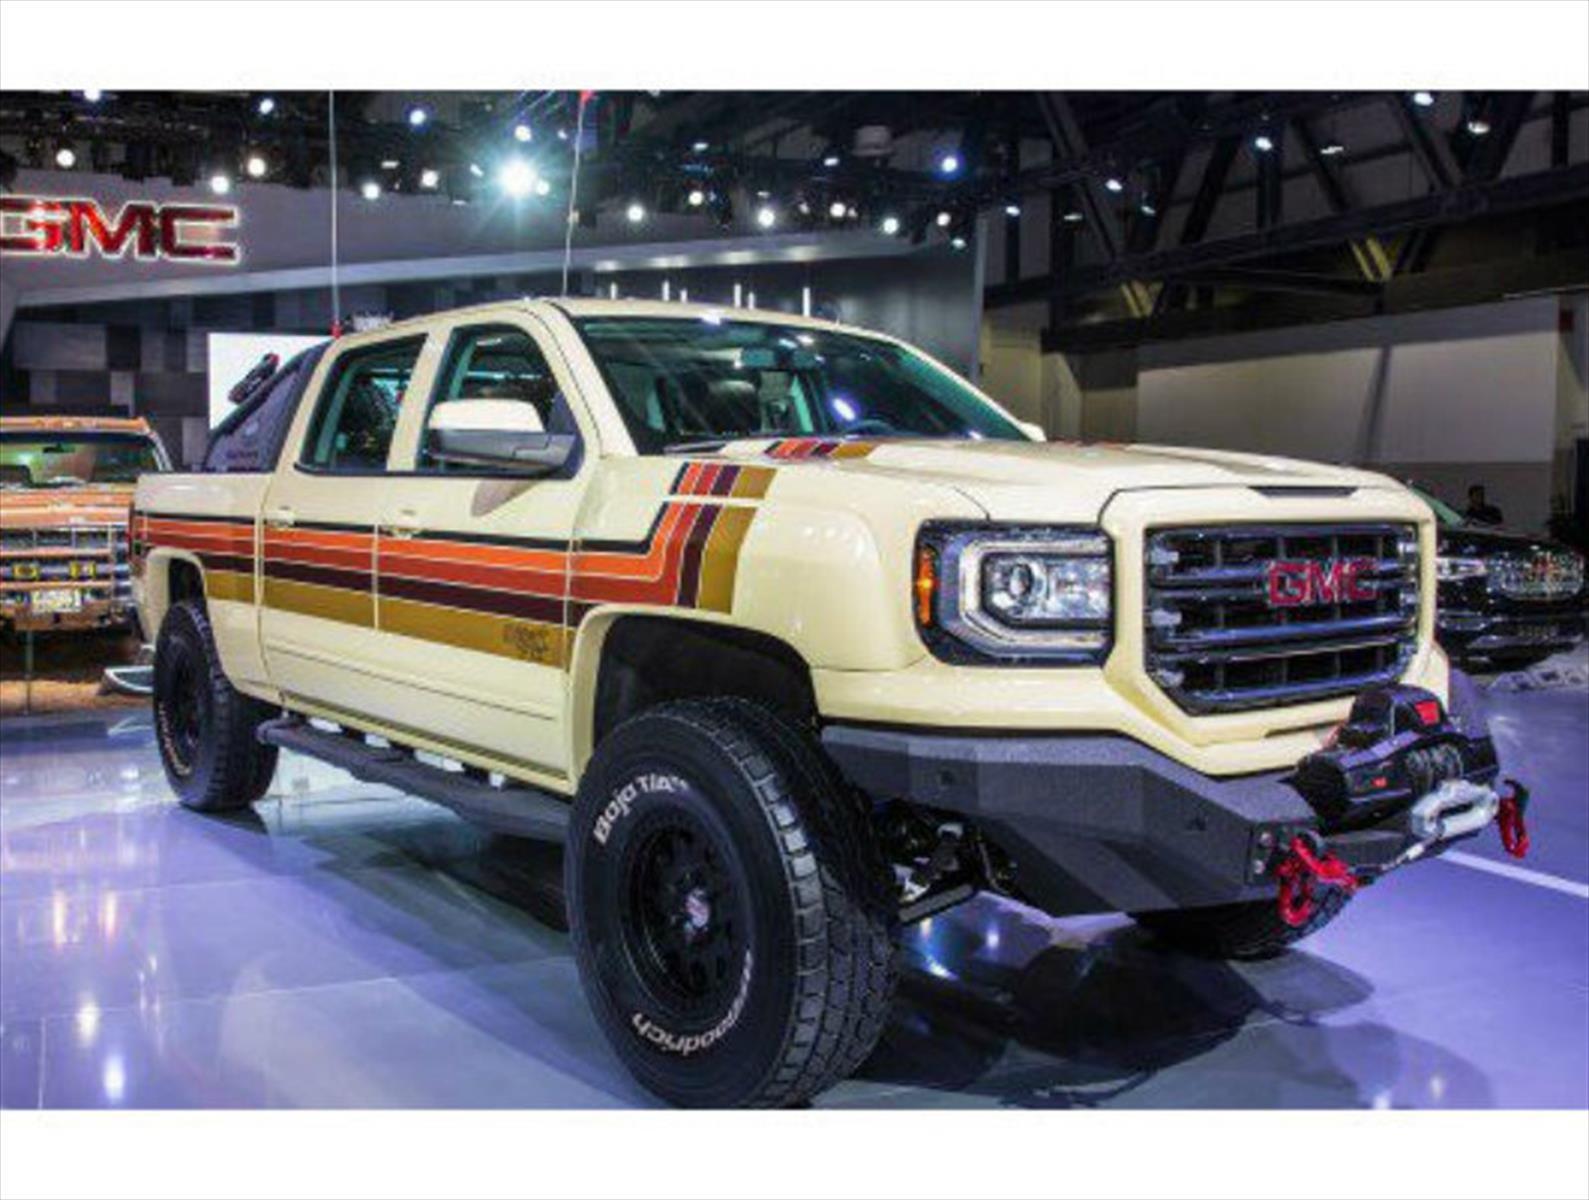 GMC Sierra Desert Fox Concept, toques retro para una pickup extrema